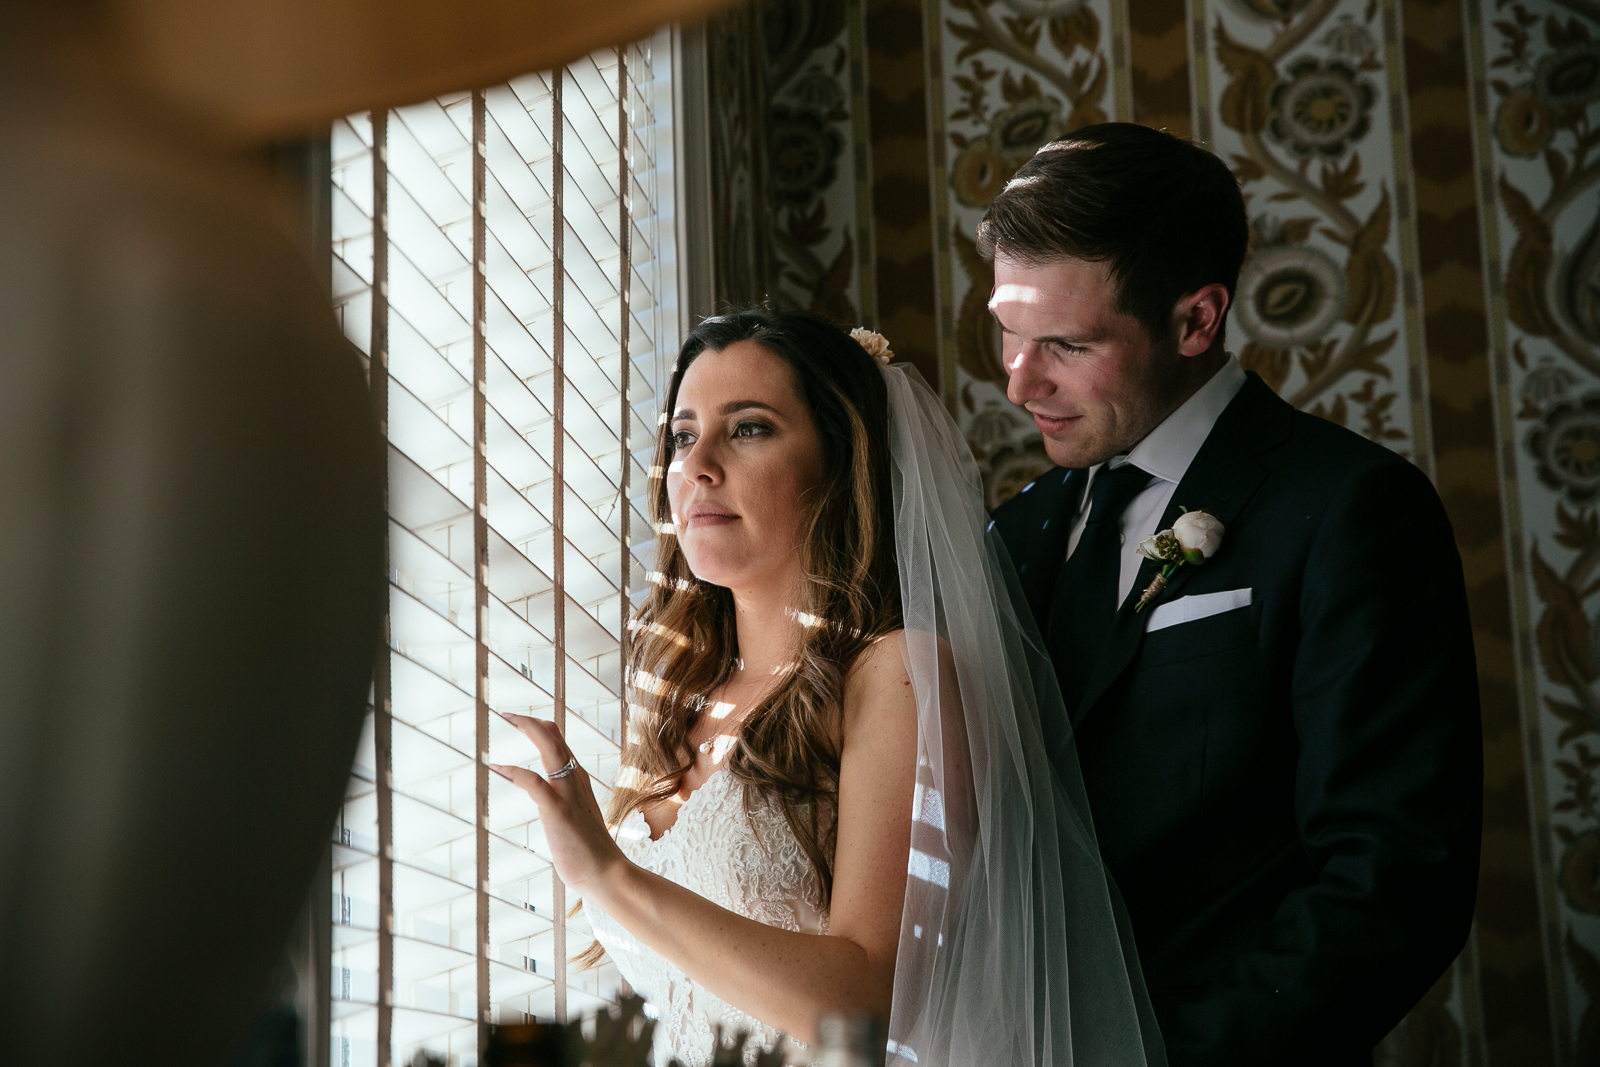 Amanda_&_Steve_Wedding_Darlington_House_La_Jolla_2015_IMG_6886.JPG